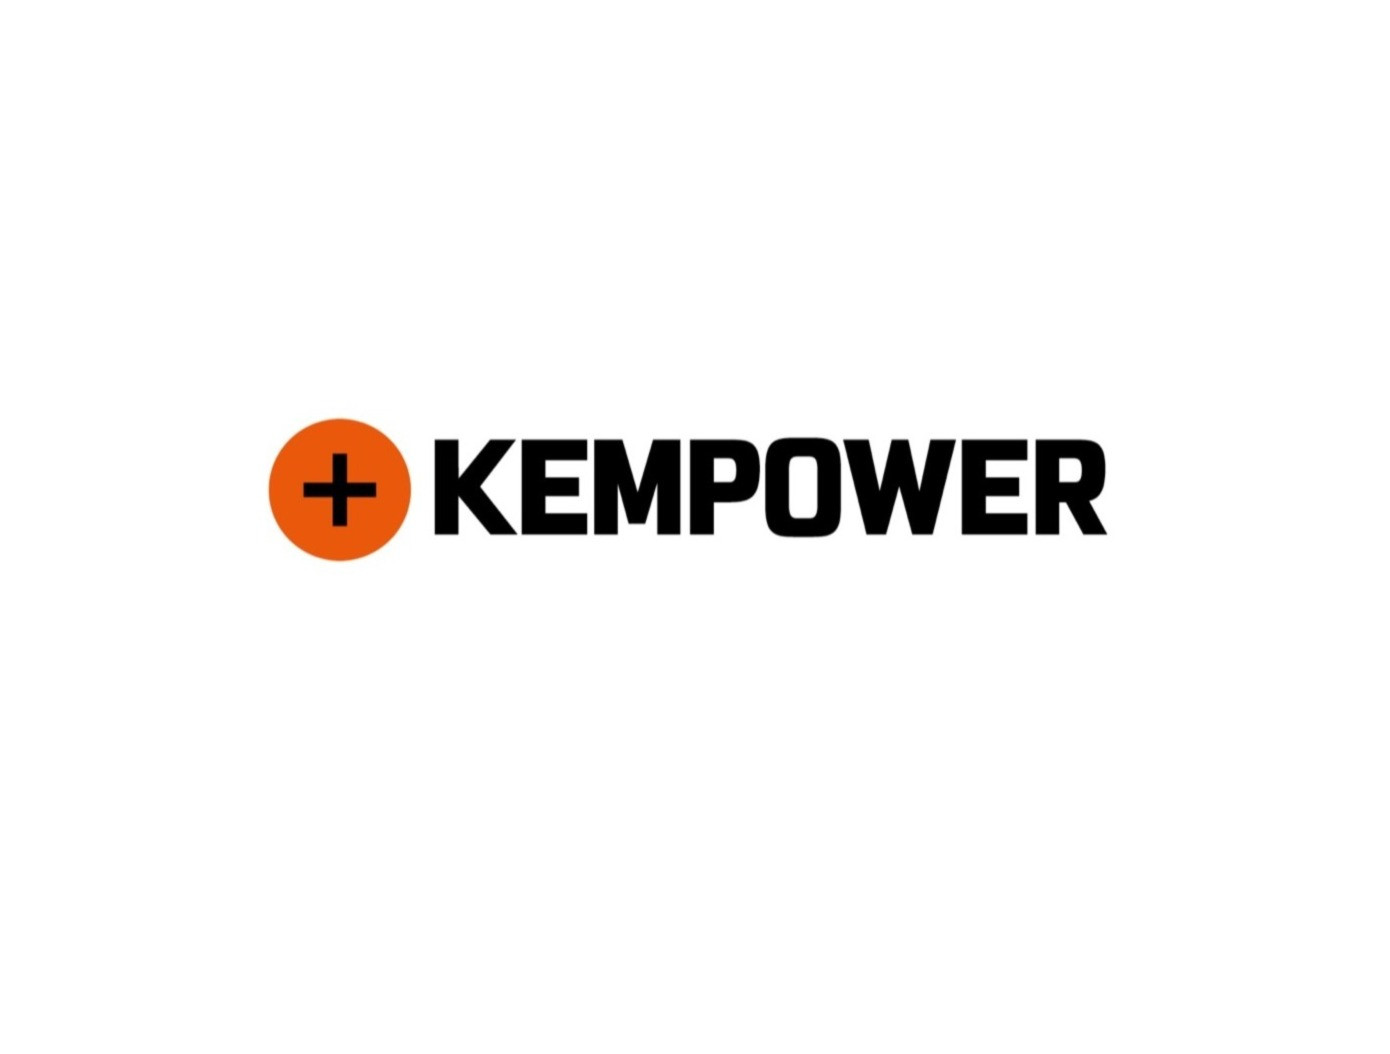 kempower_logo-3_edited_edited_edited_edi